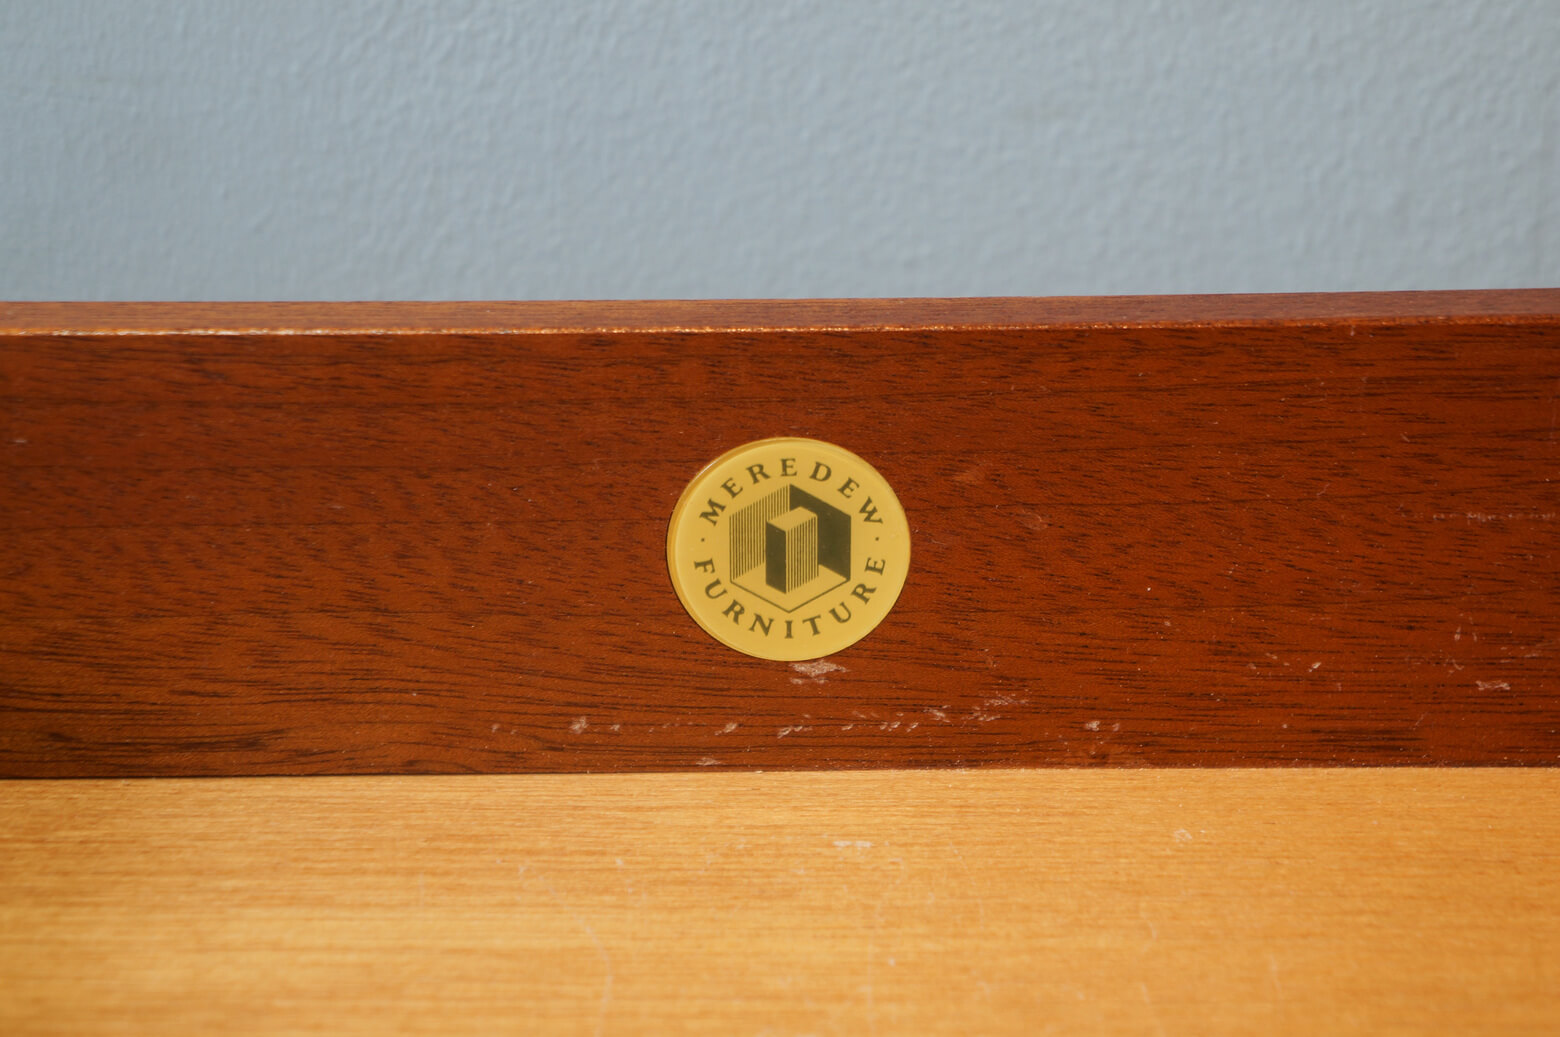 UK Vintage Meredew Oakwood Sideboard Chest/イギリス ヴィンテージ メレデュー サイドボード チェスト